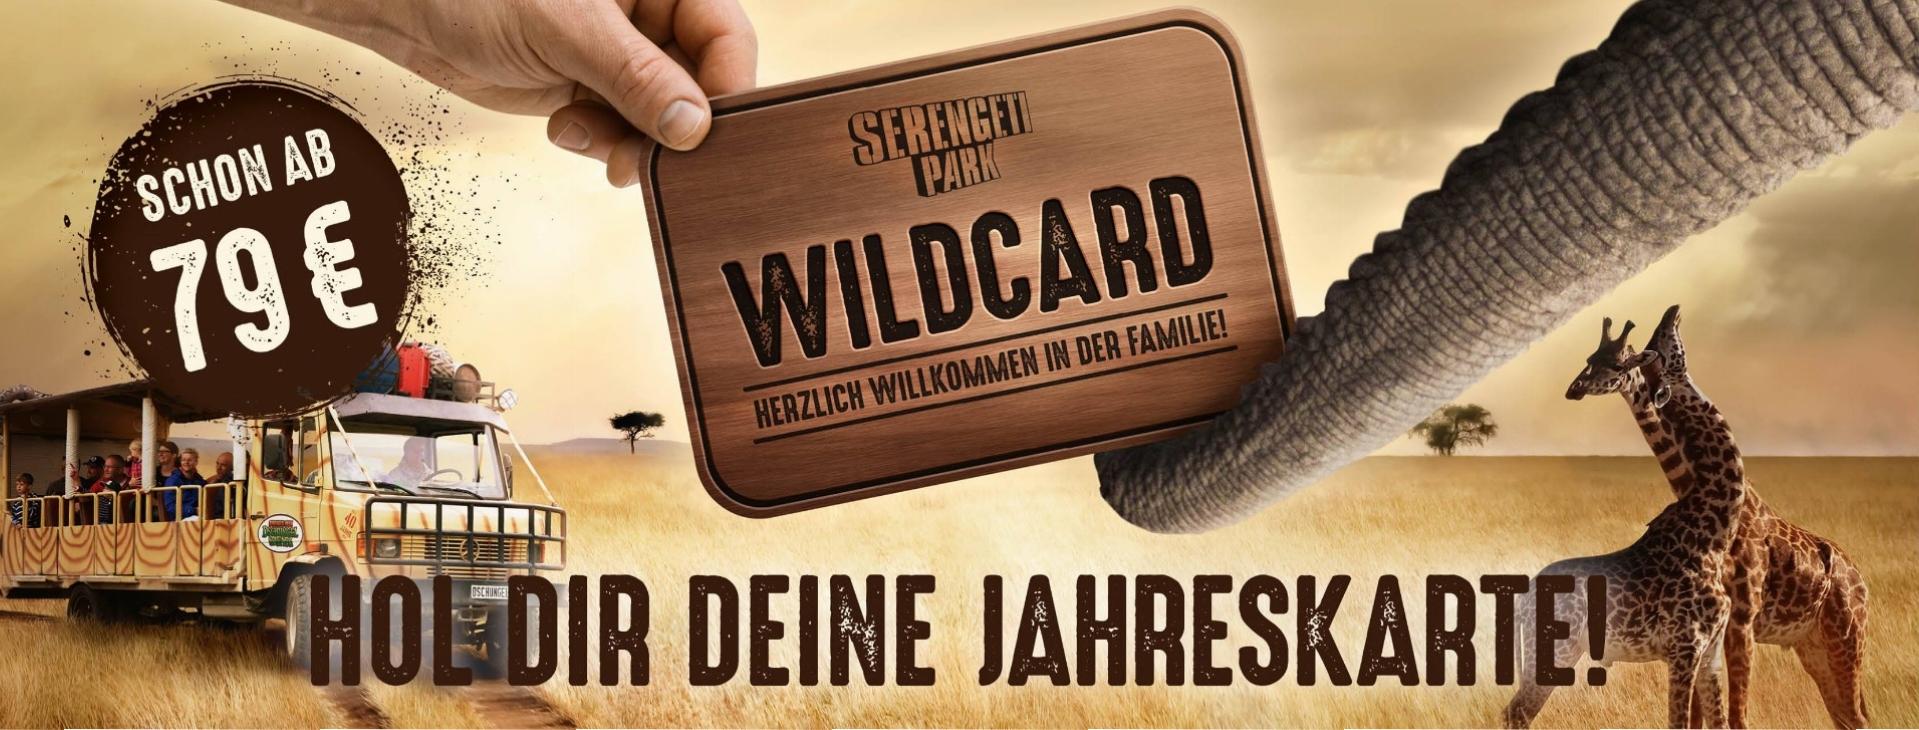 https://www.serengeti-park.de/